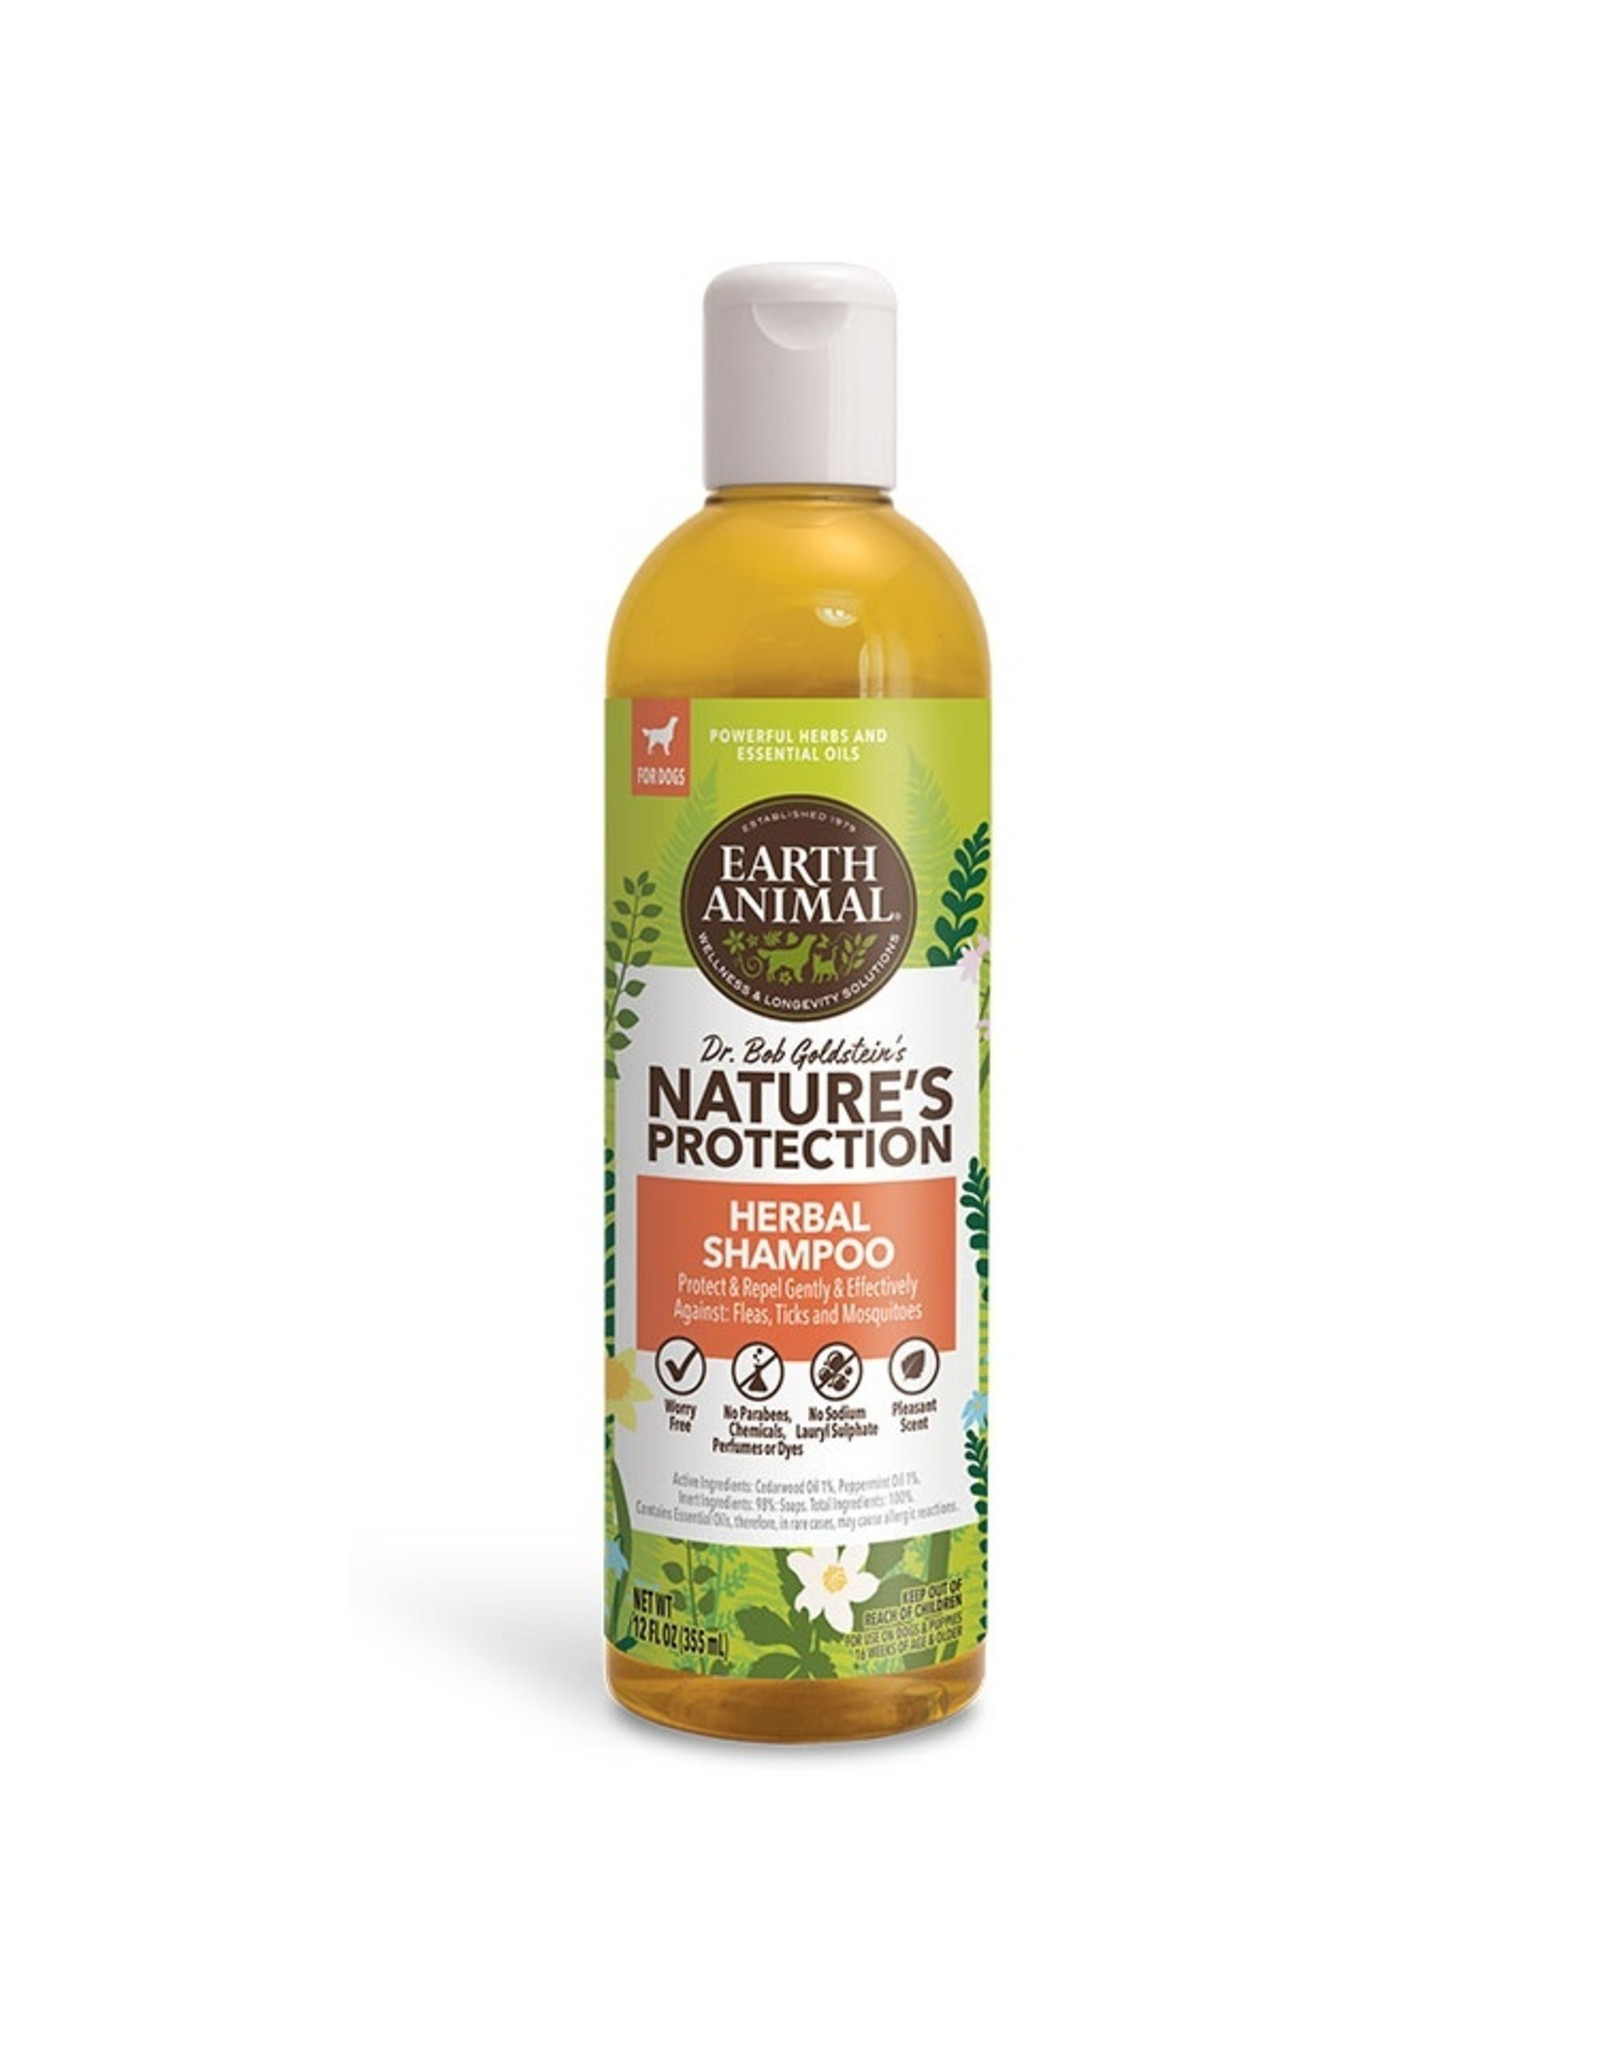 Earth Animal Earth Animal Herbal Shampoo 12oz